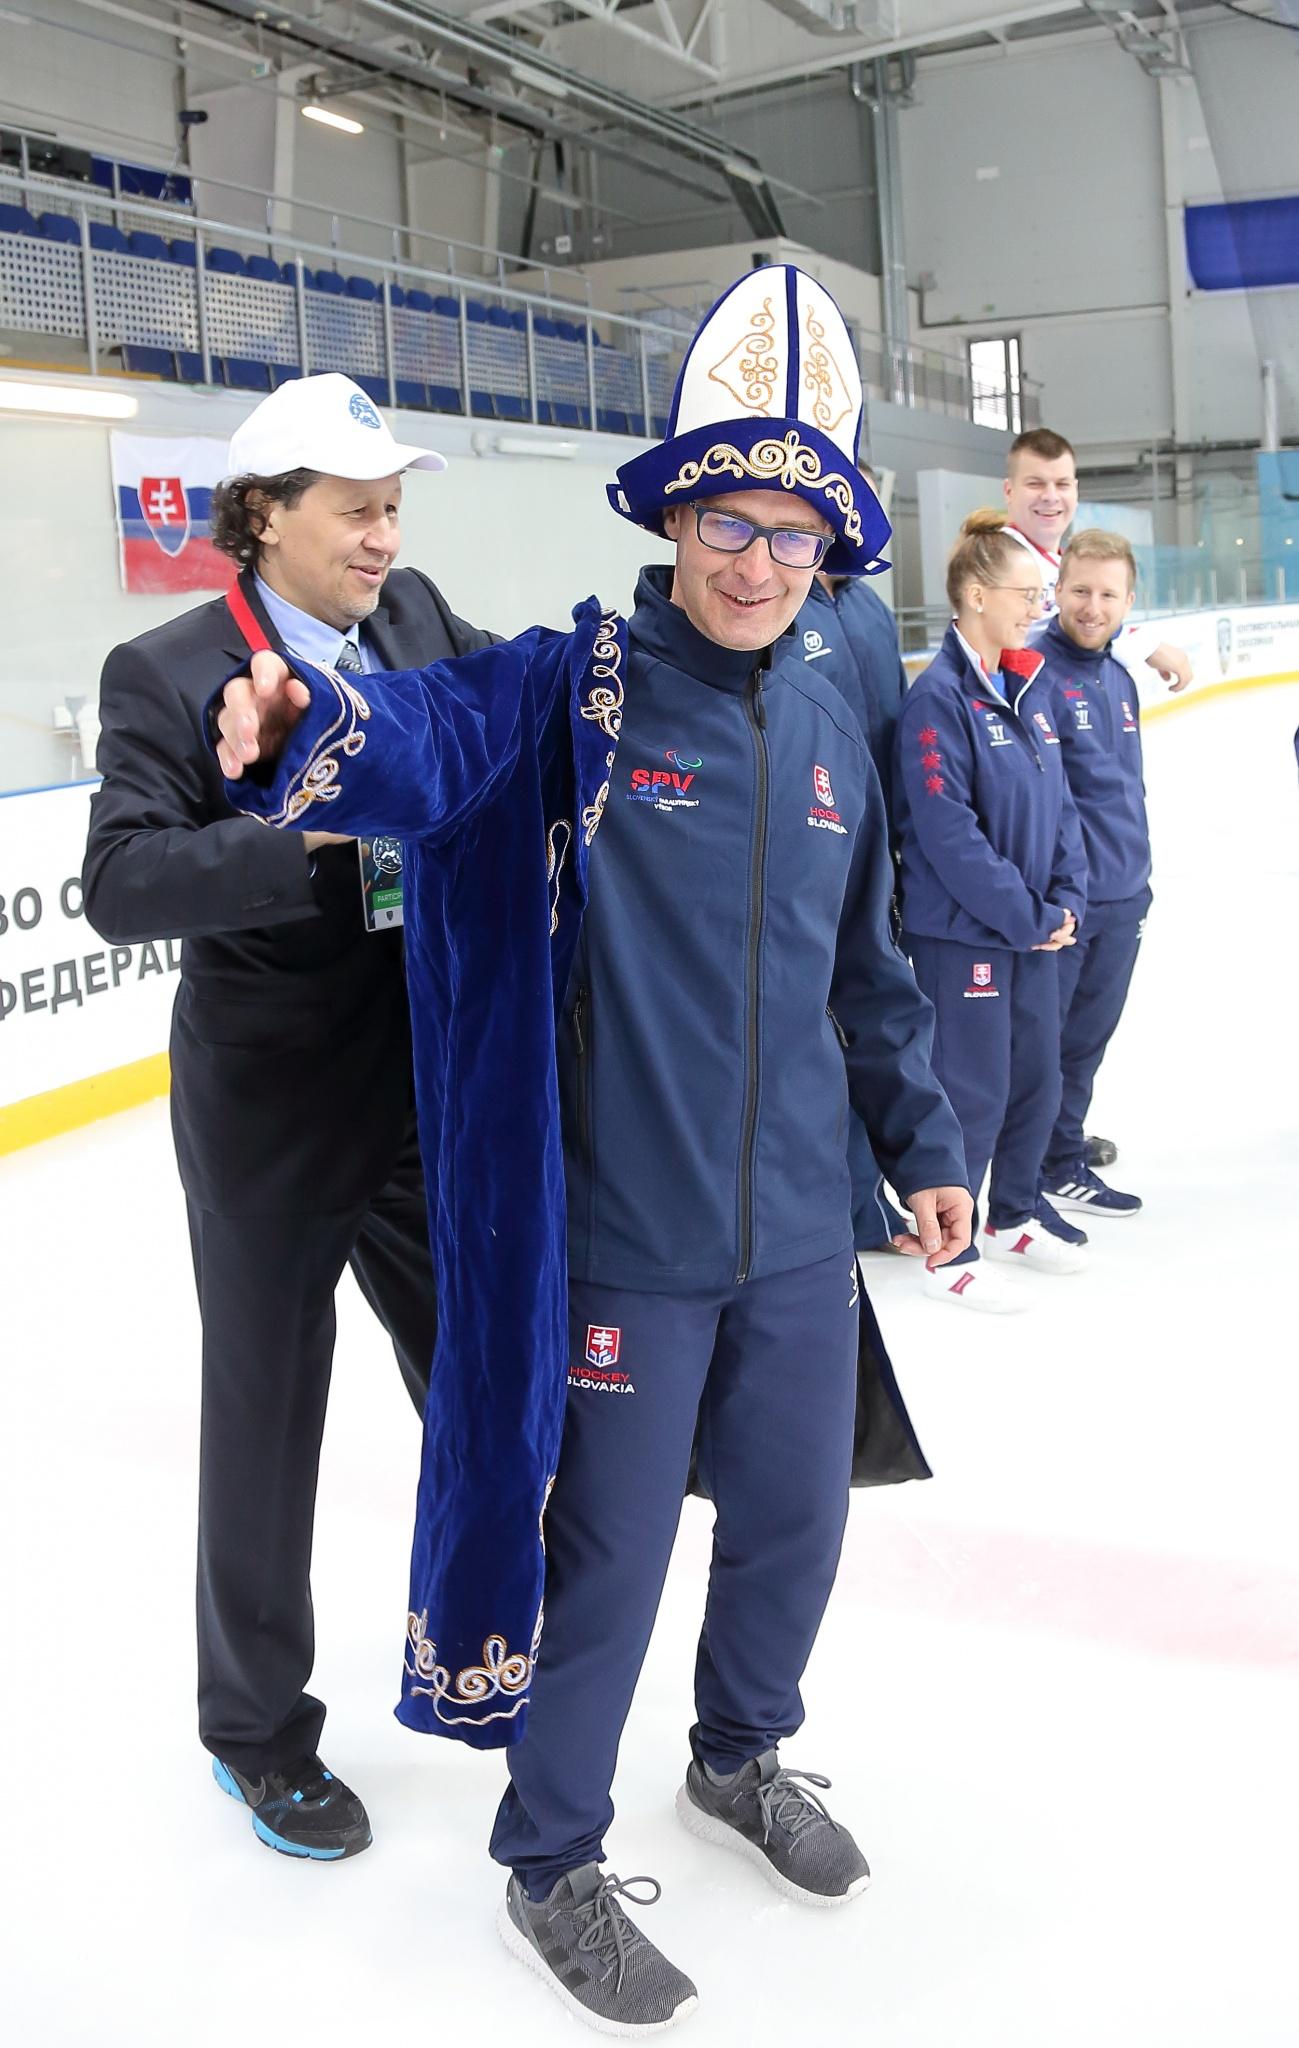 Радослав Белечка. Фото: Дмитрий Бондаренко